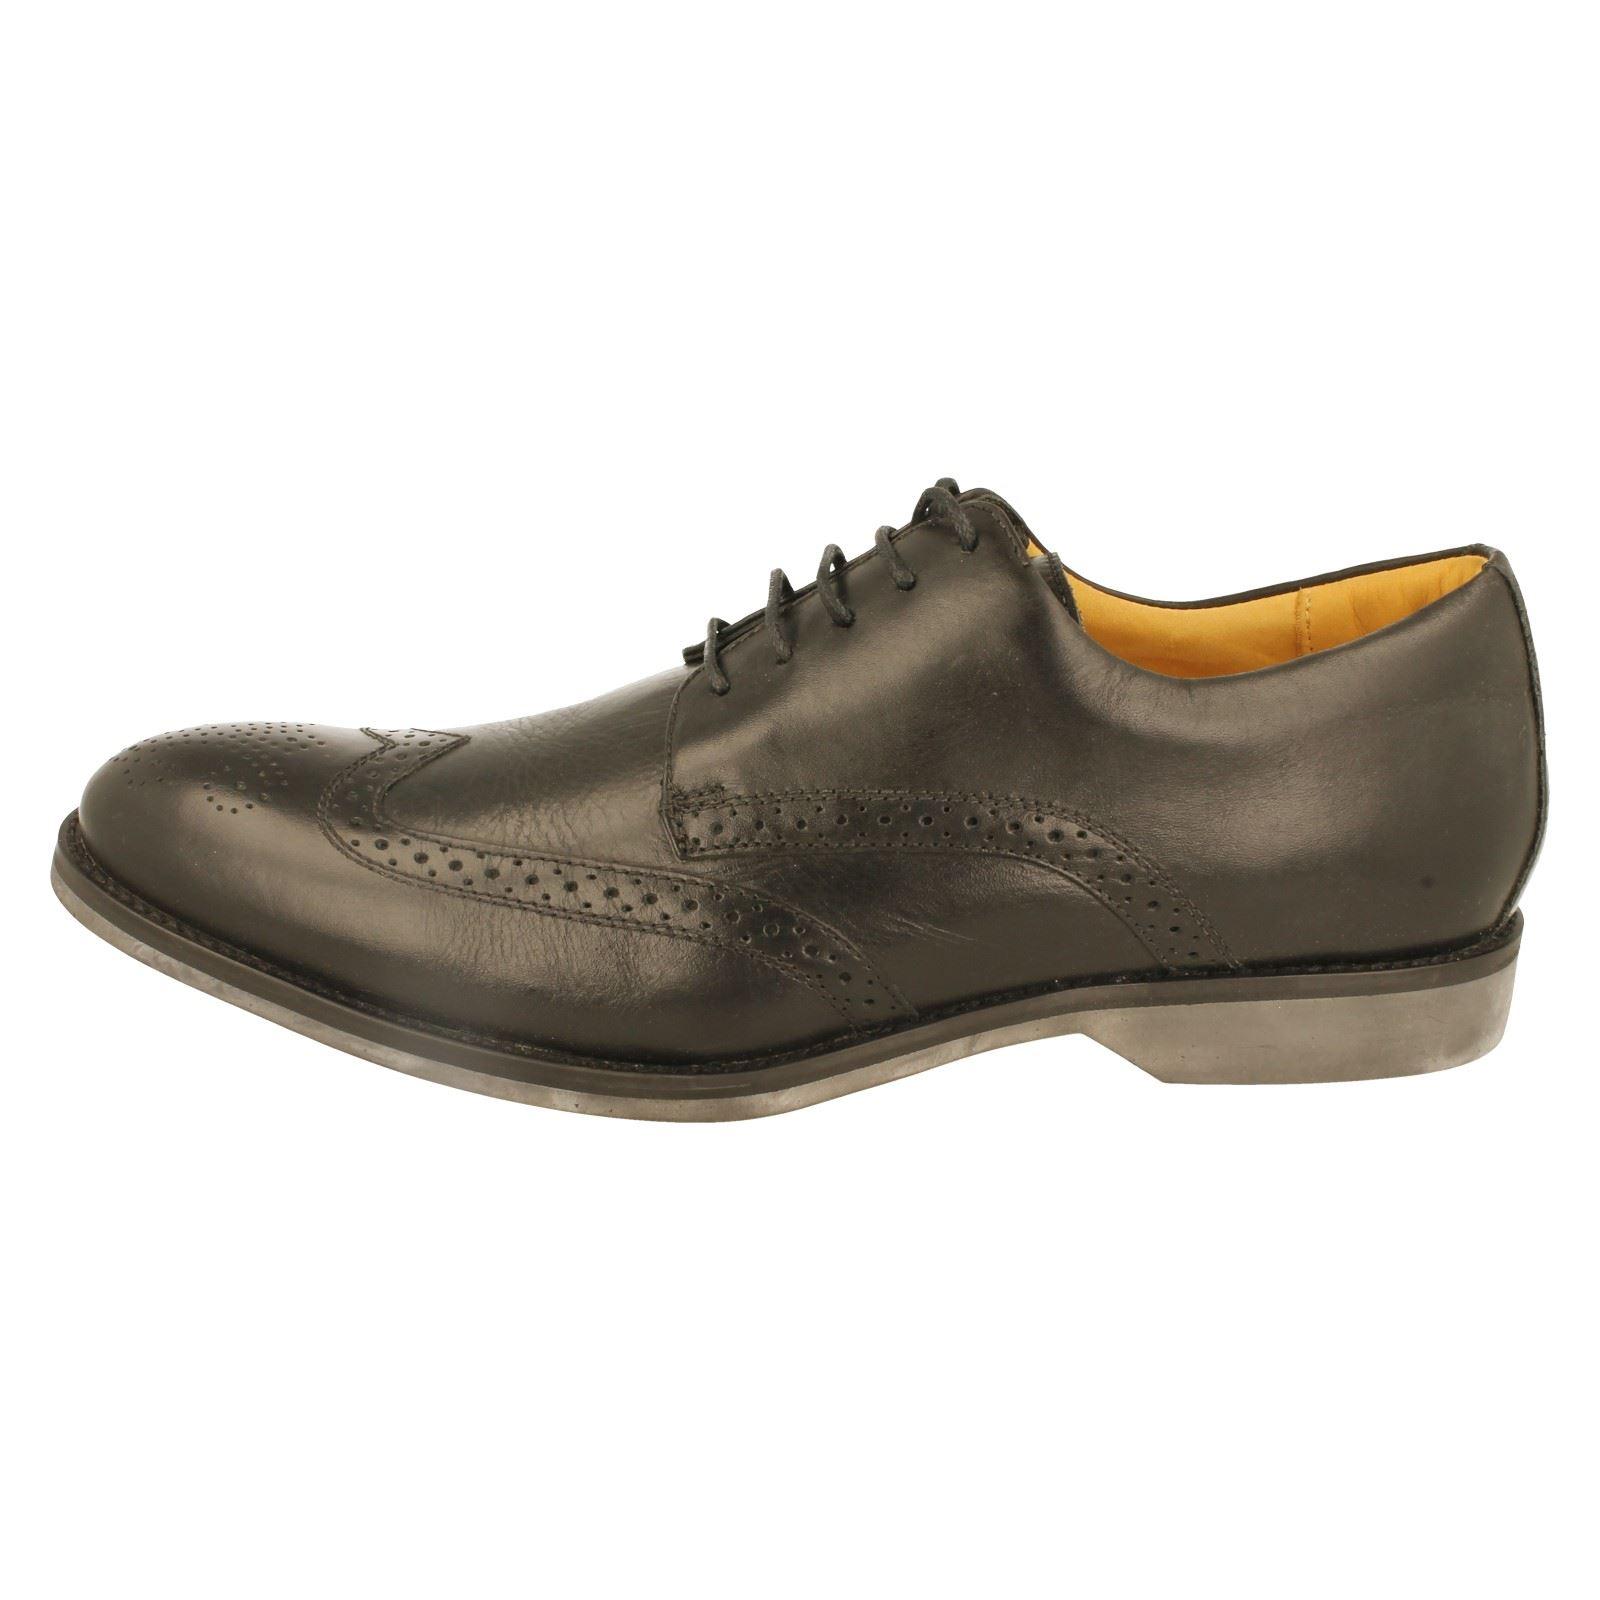 Mens Anatomic Anatomic Mens Shoes Style Morumbi -w 84f219